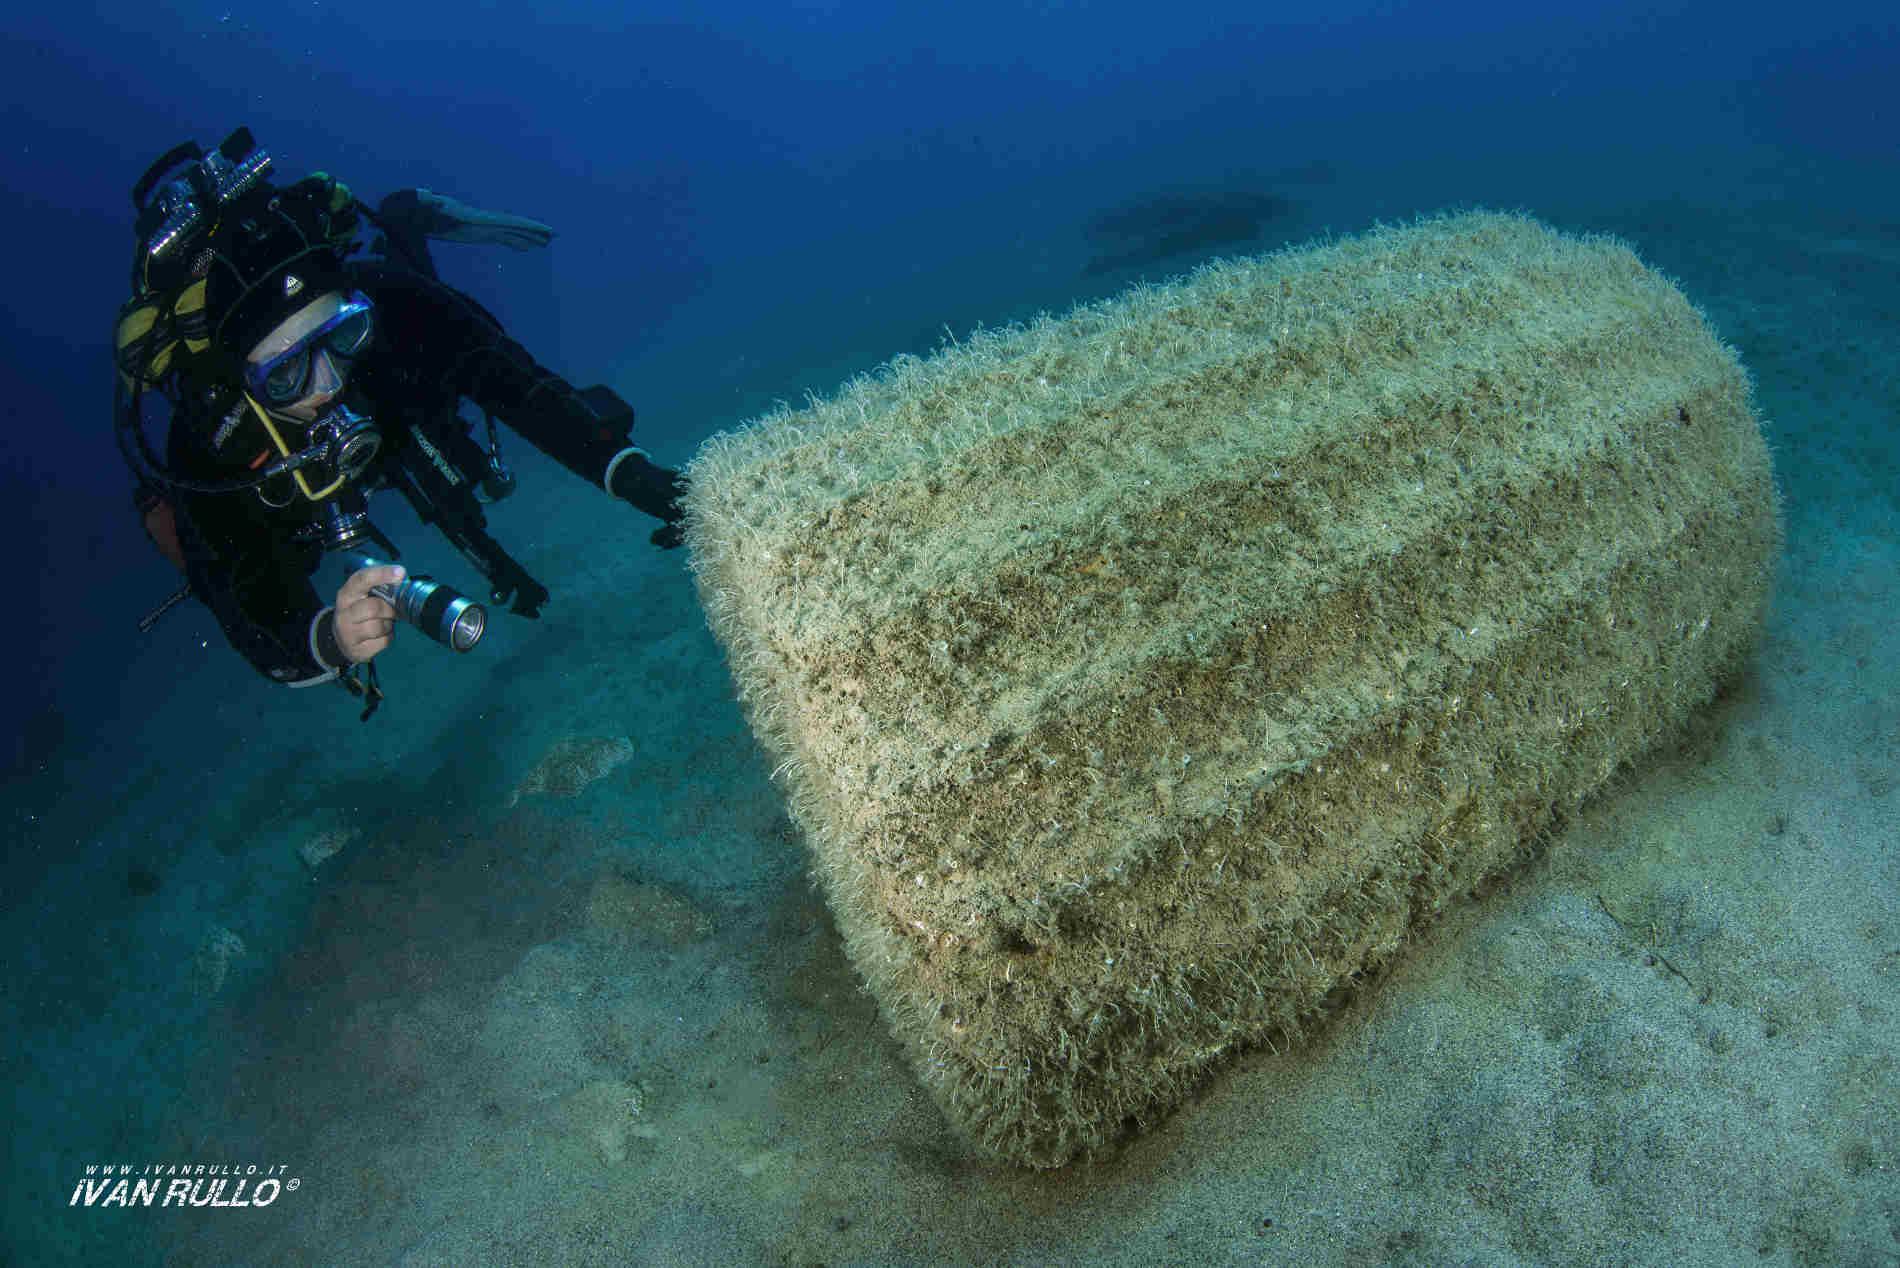 Parco Archeologico subacqueo dell'antica Kaulon a Monasterace Marina Esperienze subacquee Reggio Calabria